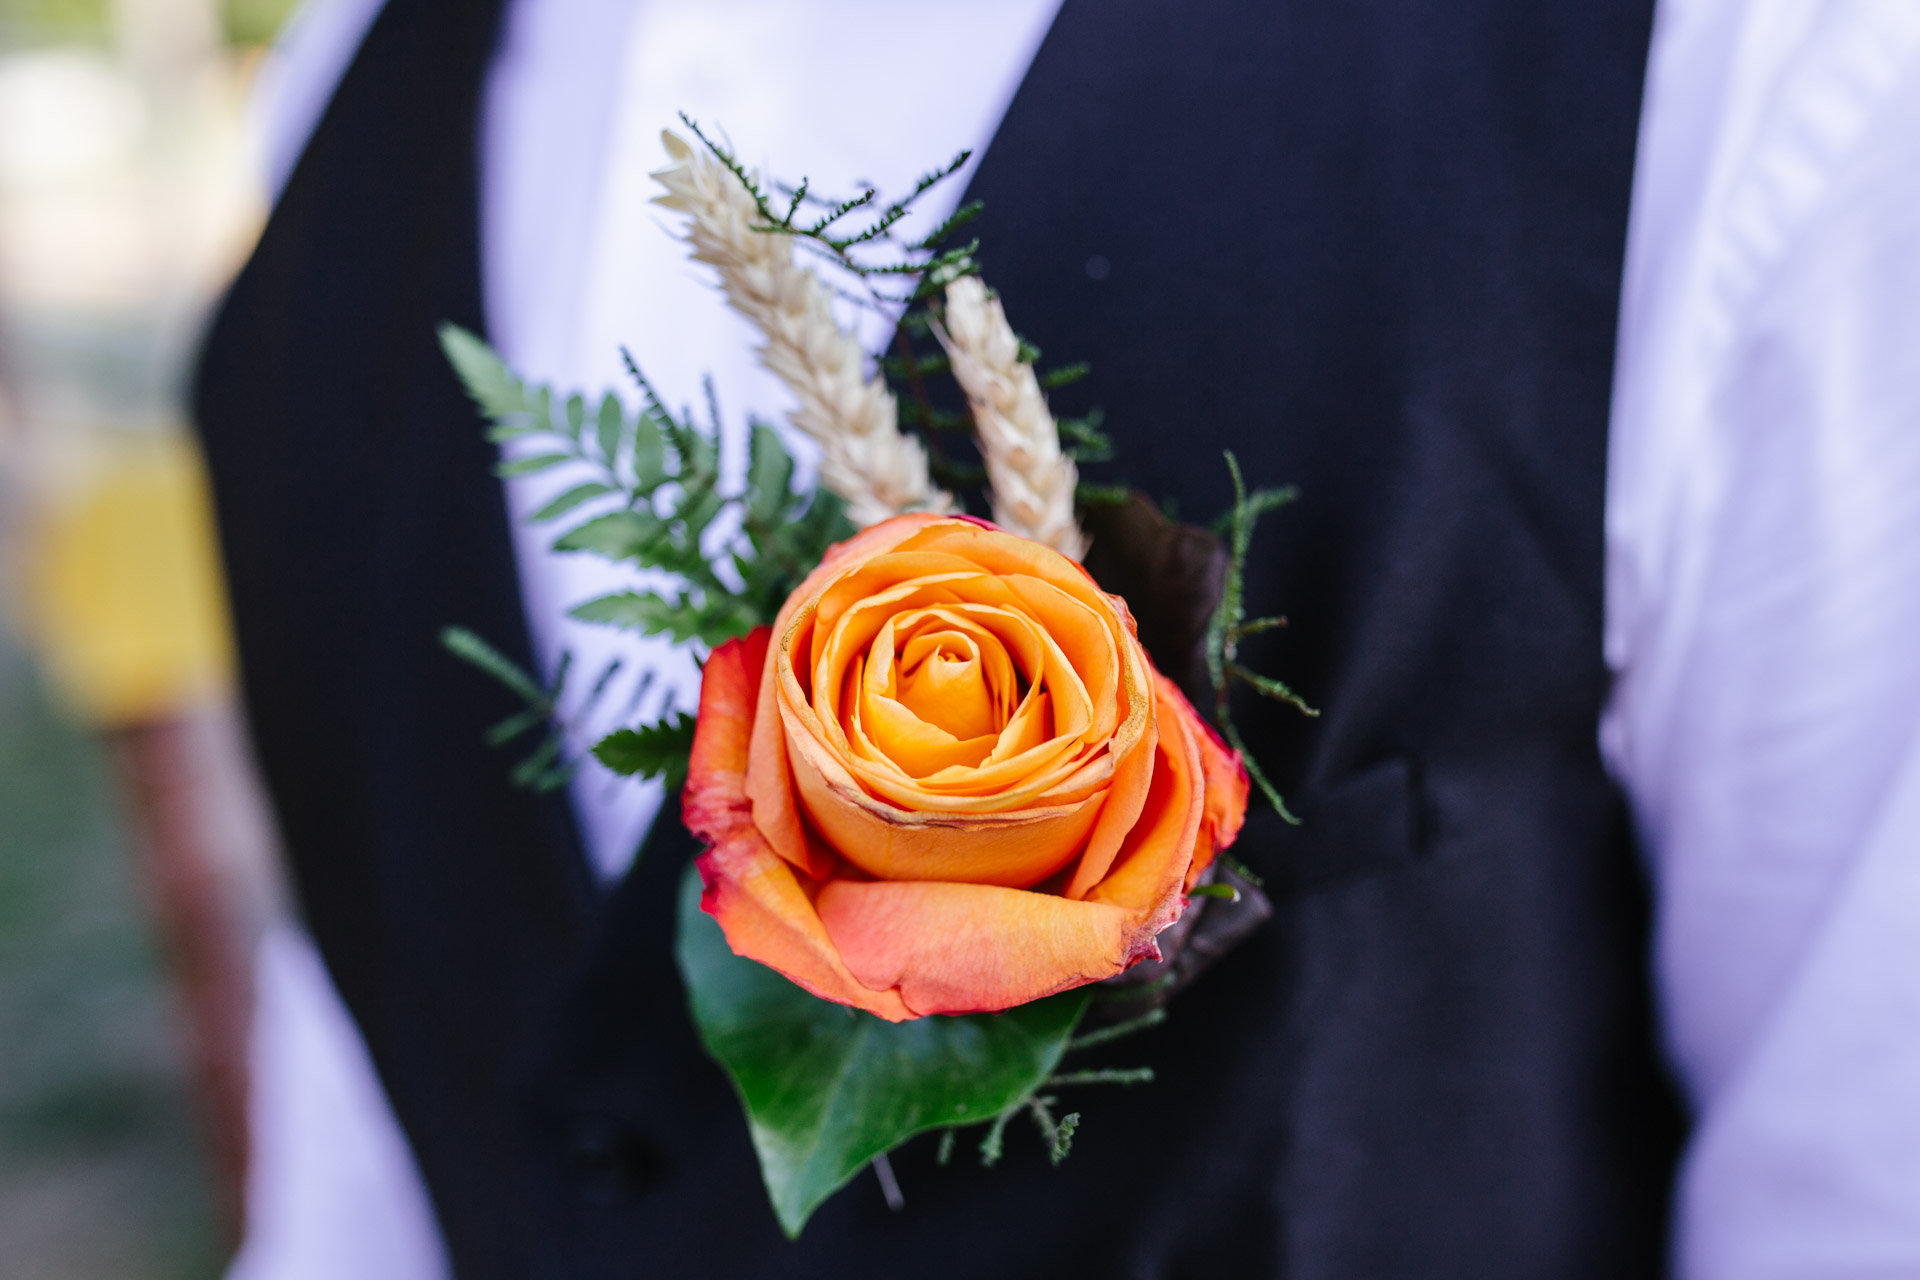 Pixelart_Hochzeitsfotografen_Loerrach_Rheinfelden_Hallwil_Schweiz_Linda-Ramon-1047